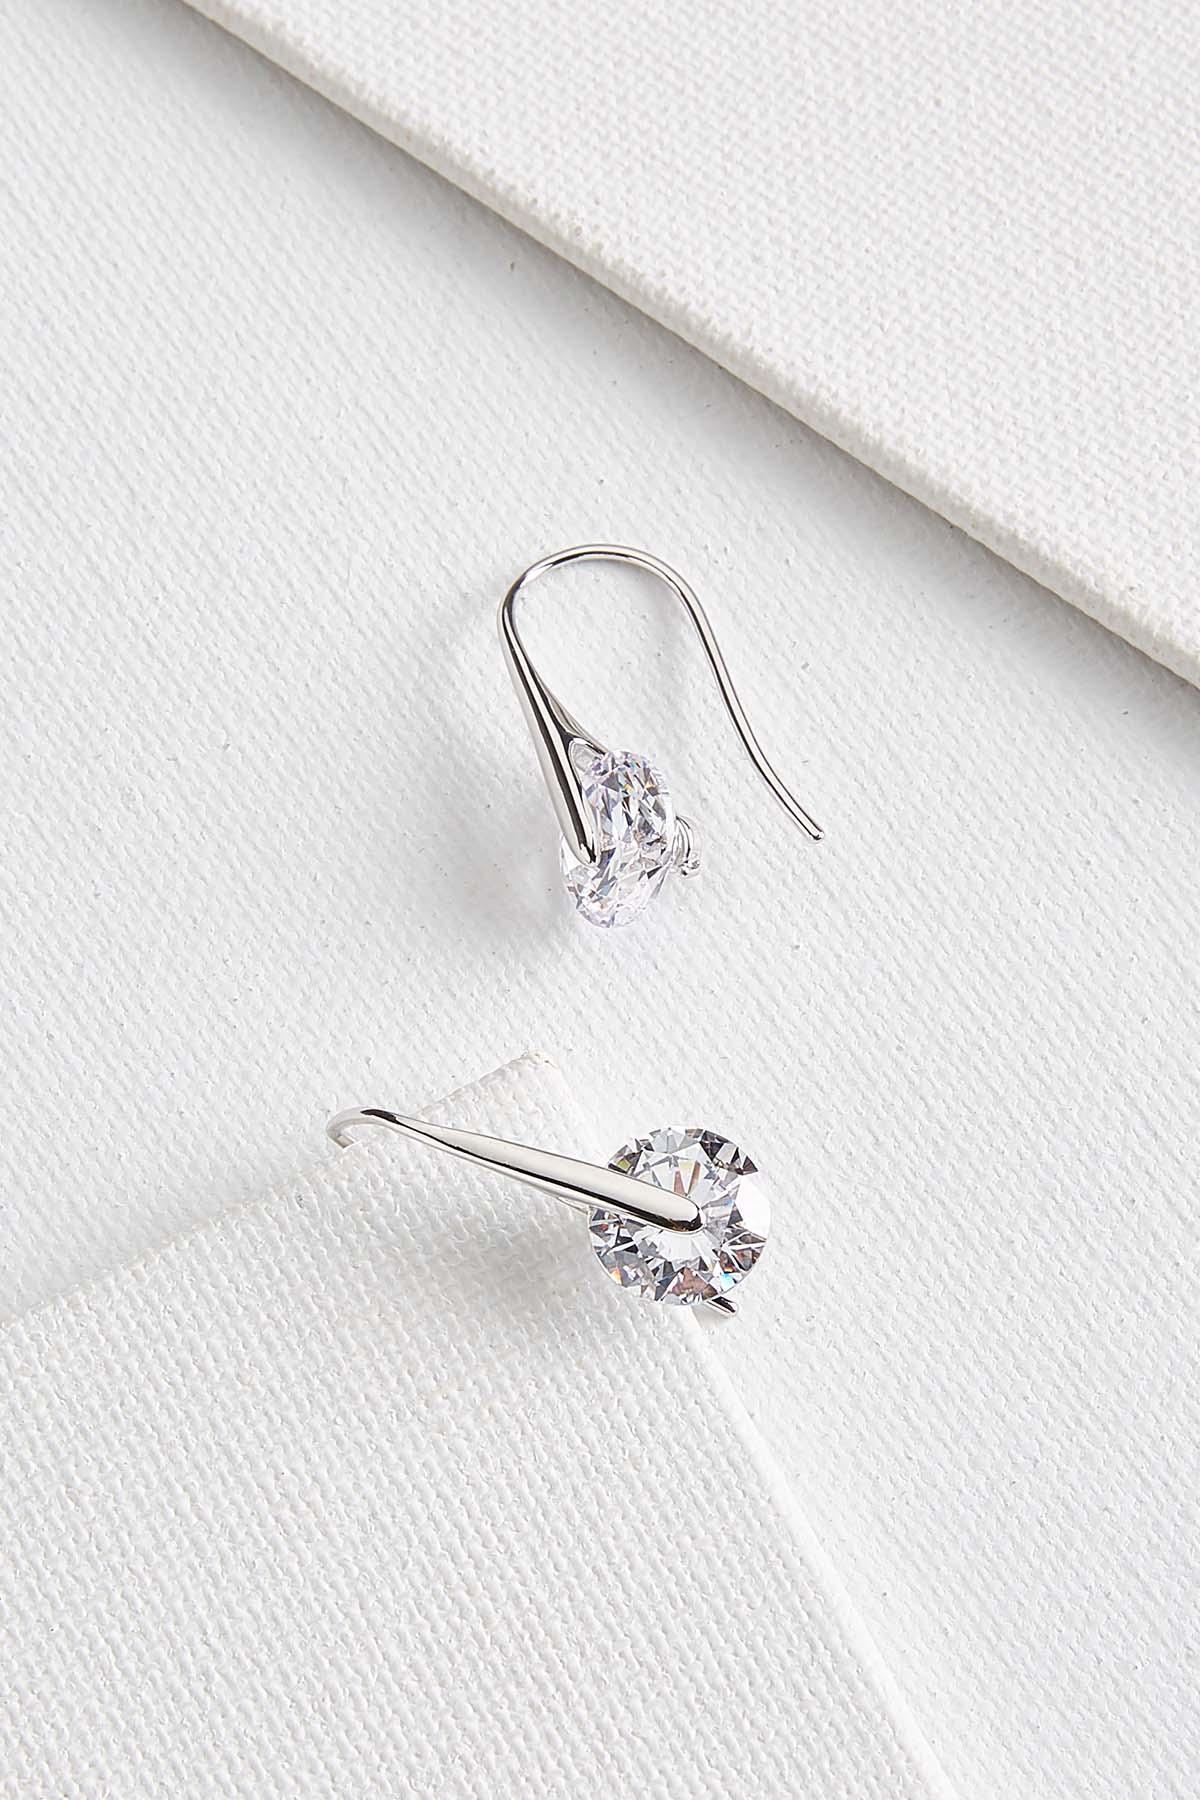 Romancing The Stone Earrings